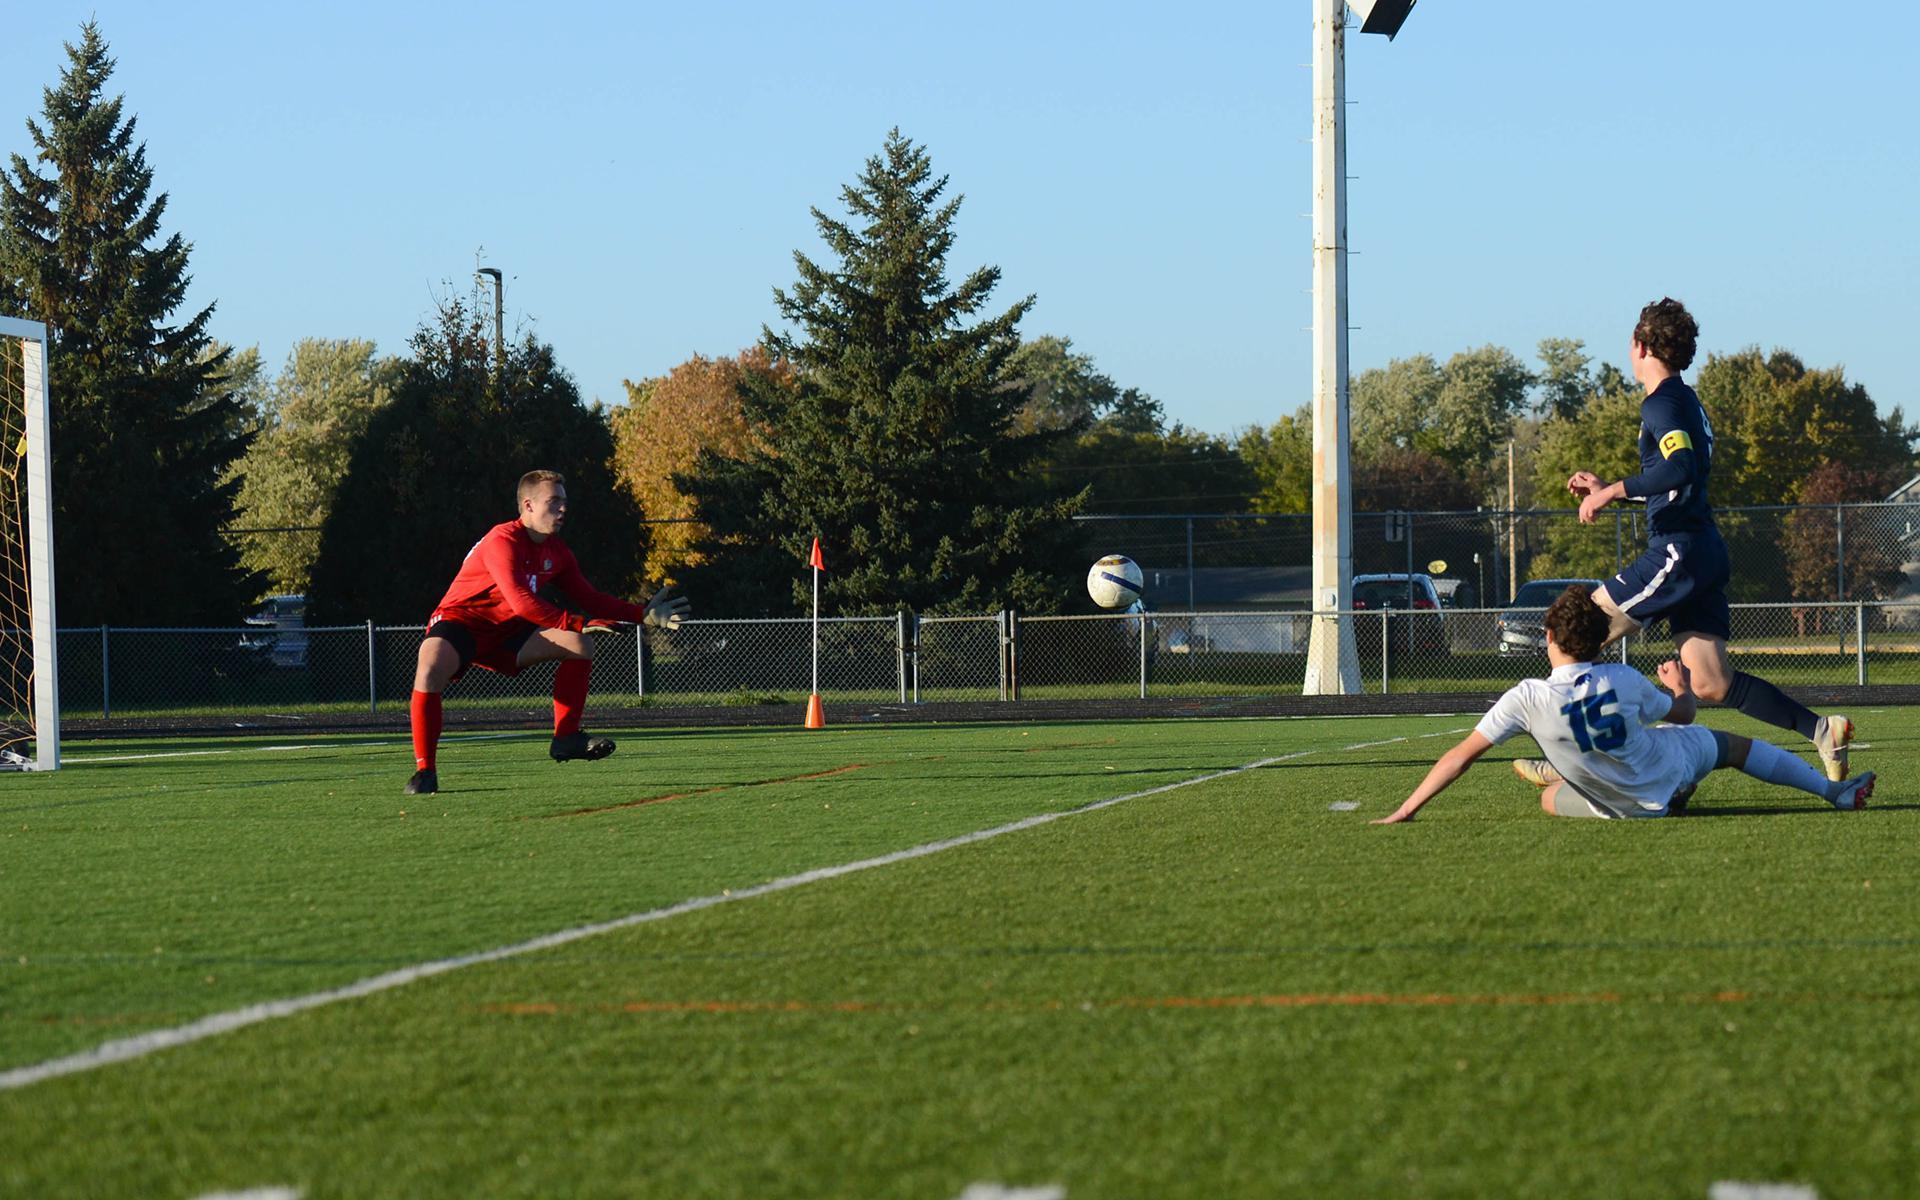 Blake defender Jake Shapiro scores the first goal of the game against Totino-Grace.  Photo by Carter Jones, SportsEngine.